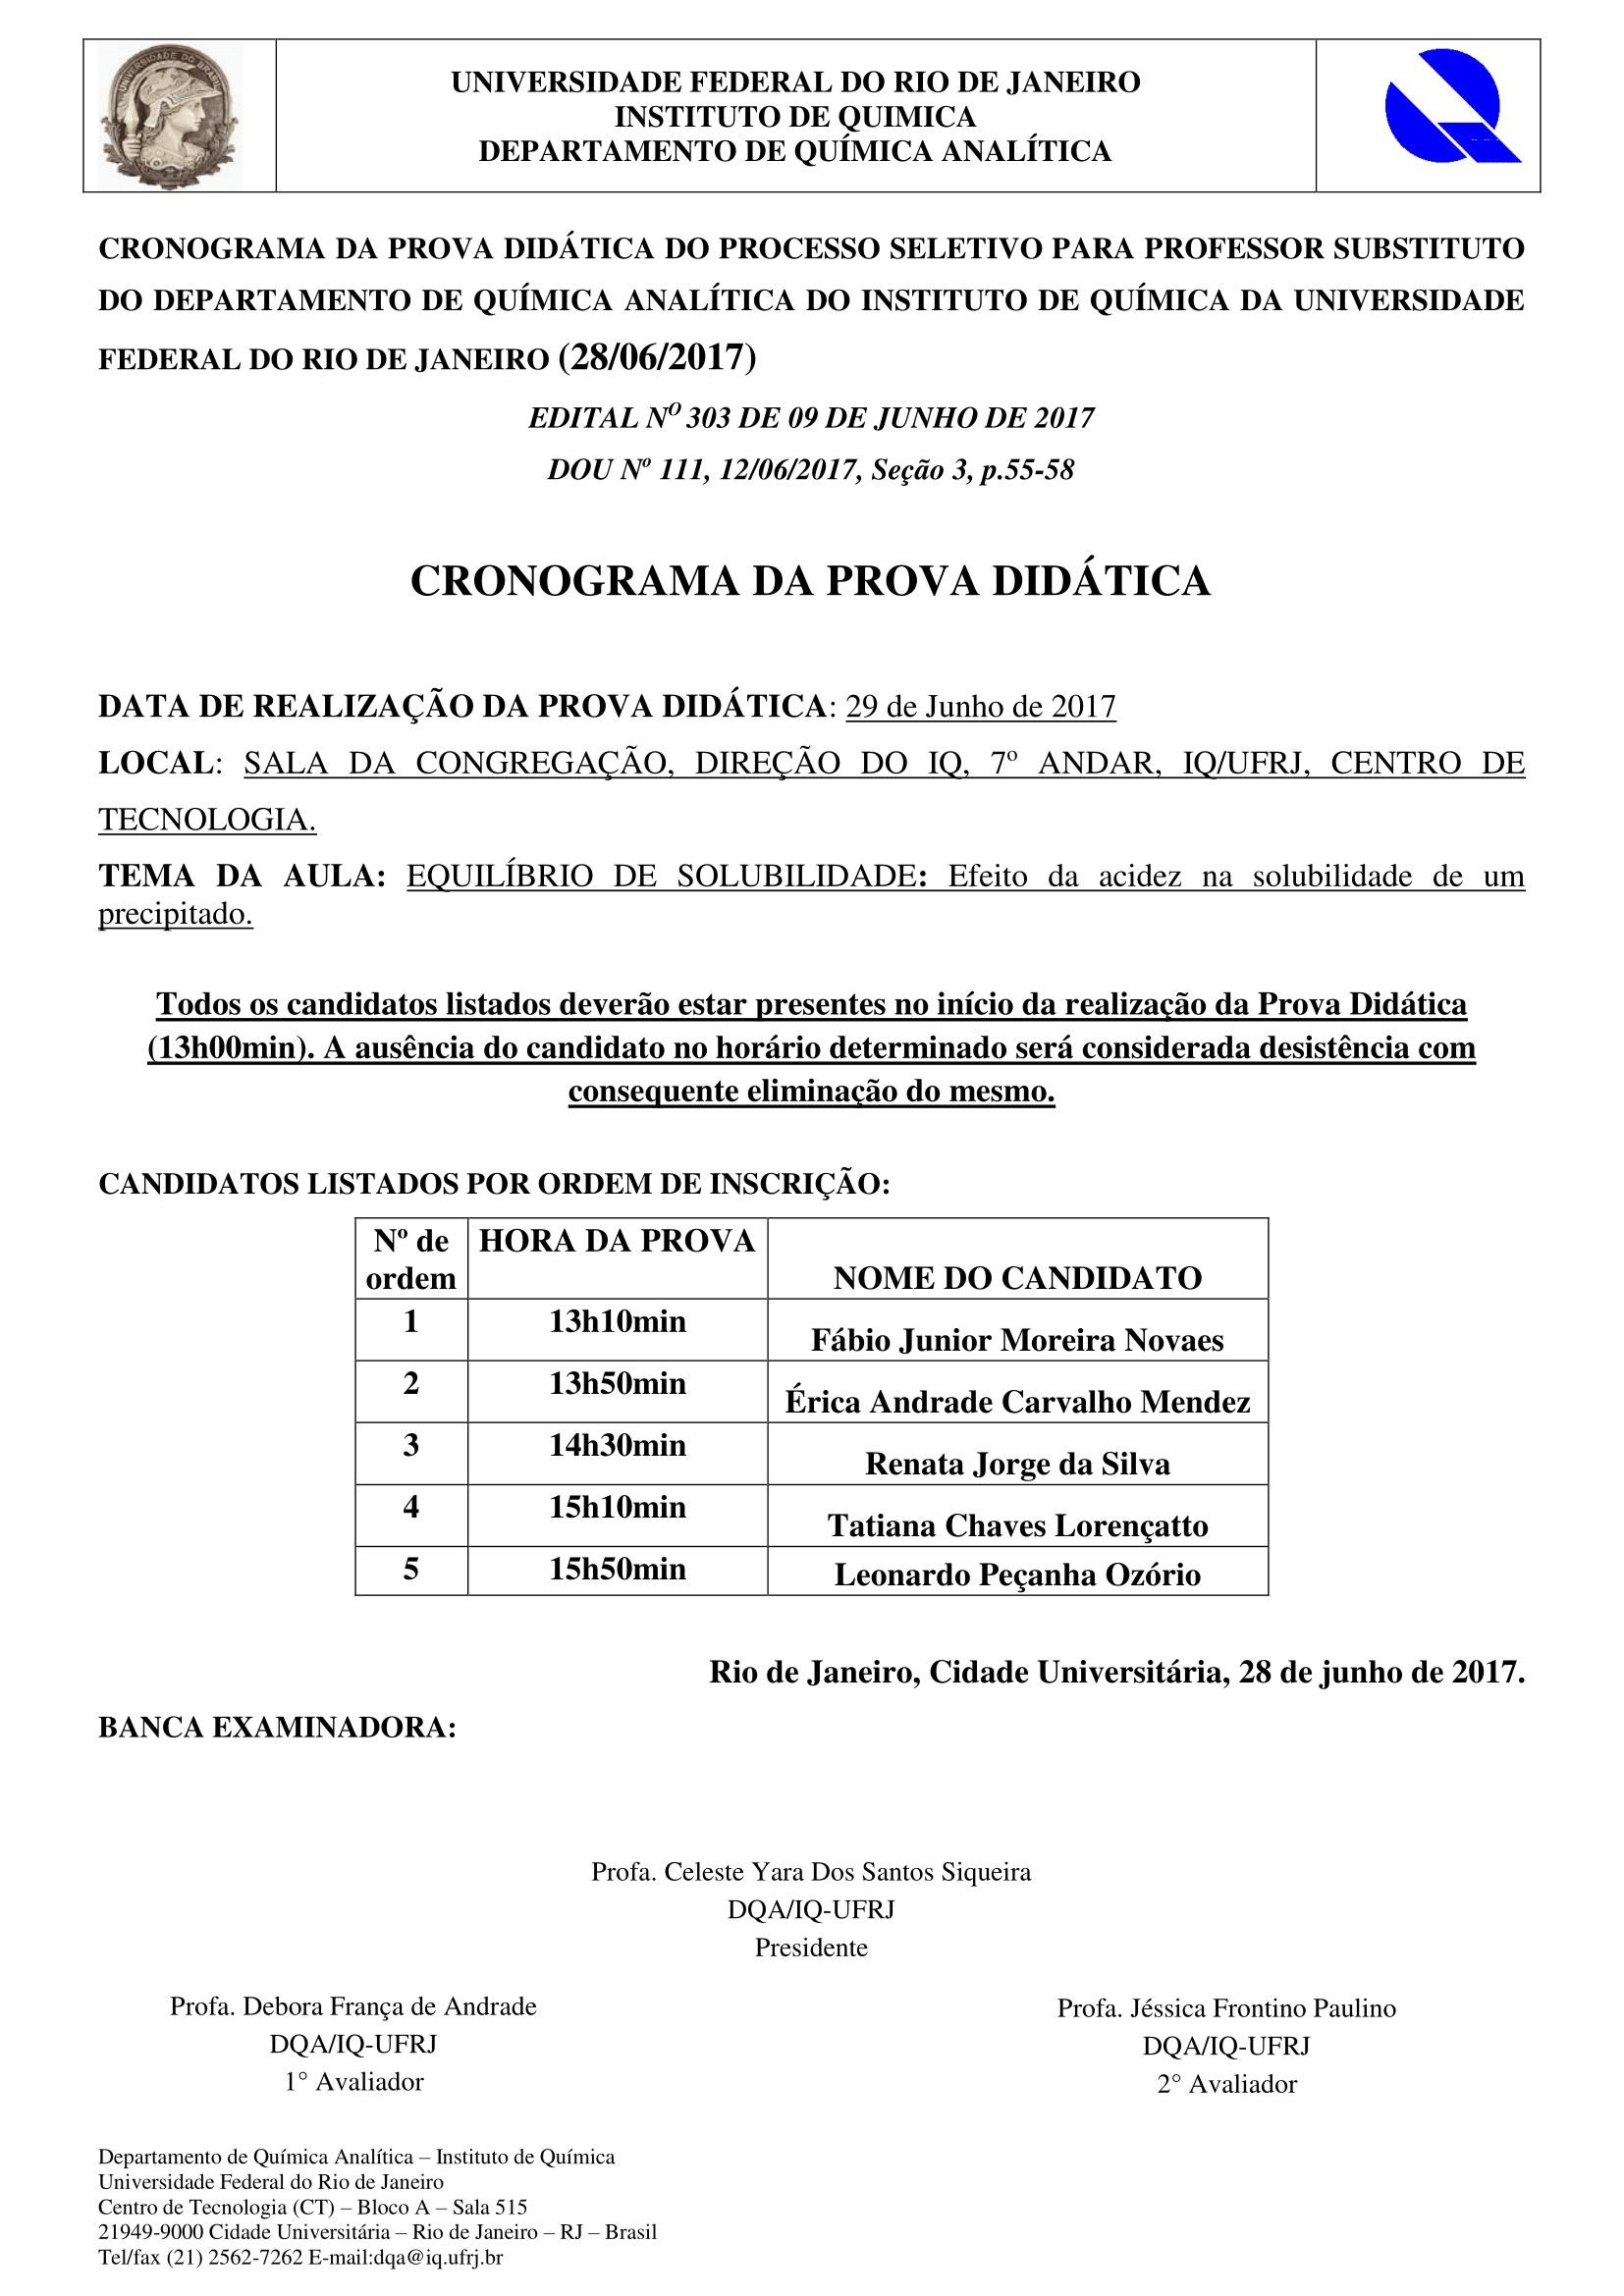 Calendario Para O Ano 2019 Brasileiro Recientes Junho 2017 Of Calendario Para O Ano 2019 Brasileiro Más Populares Index Of Midia